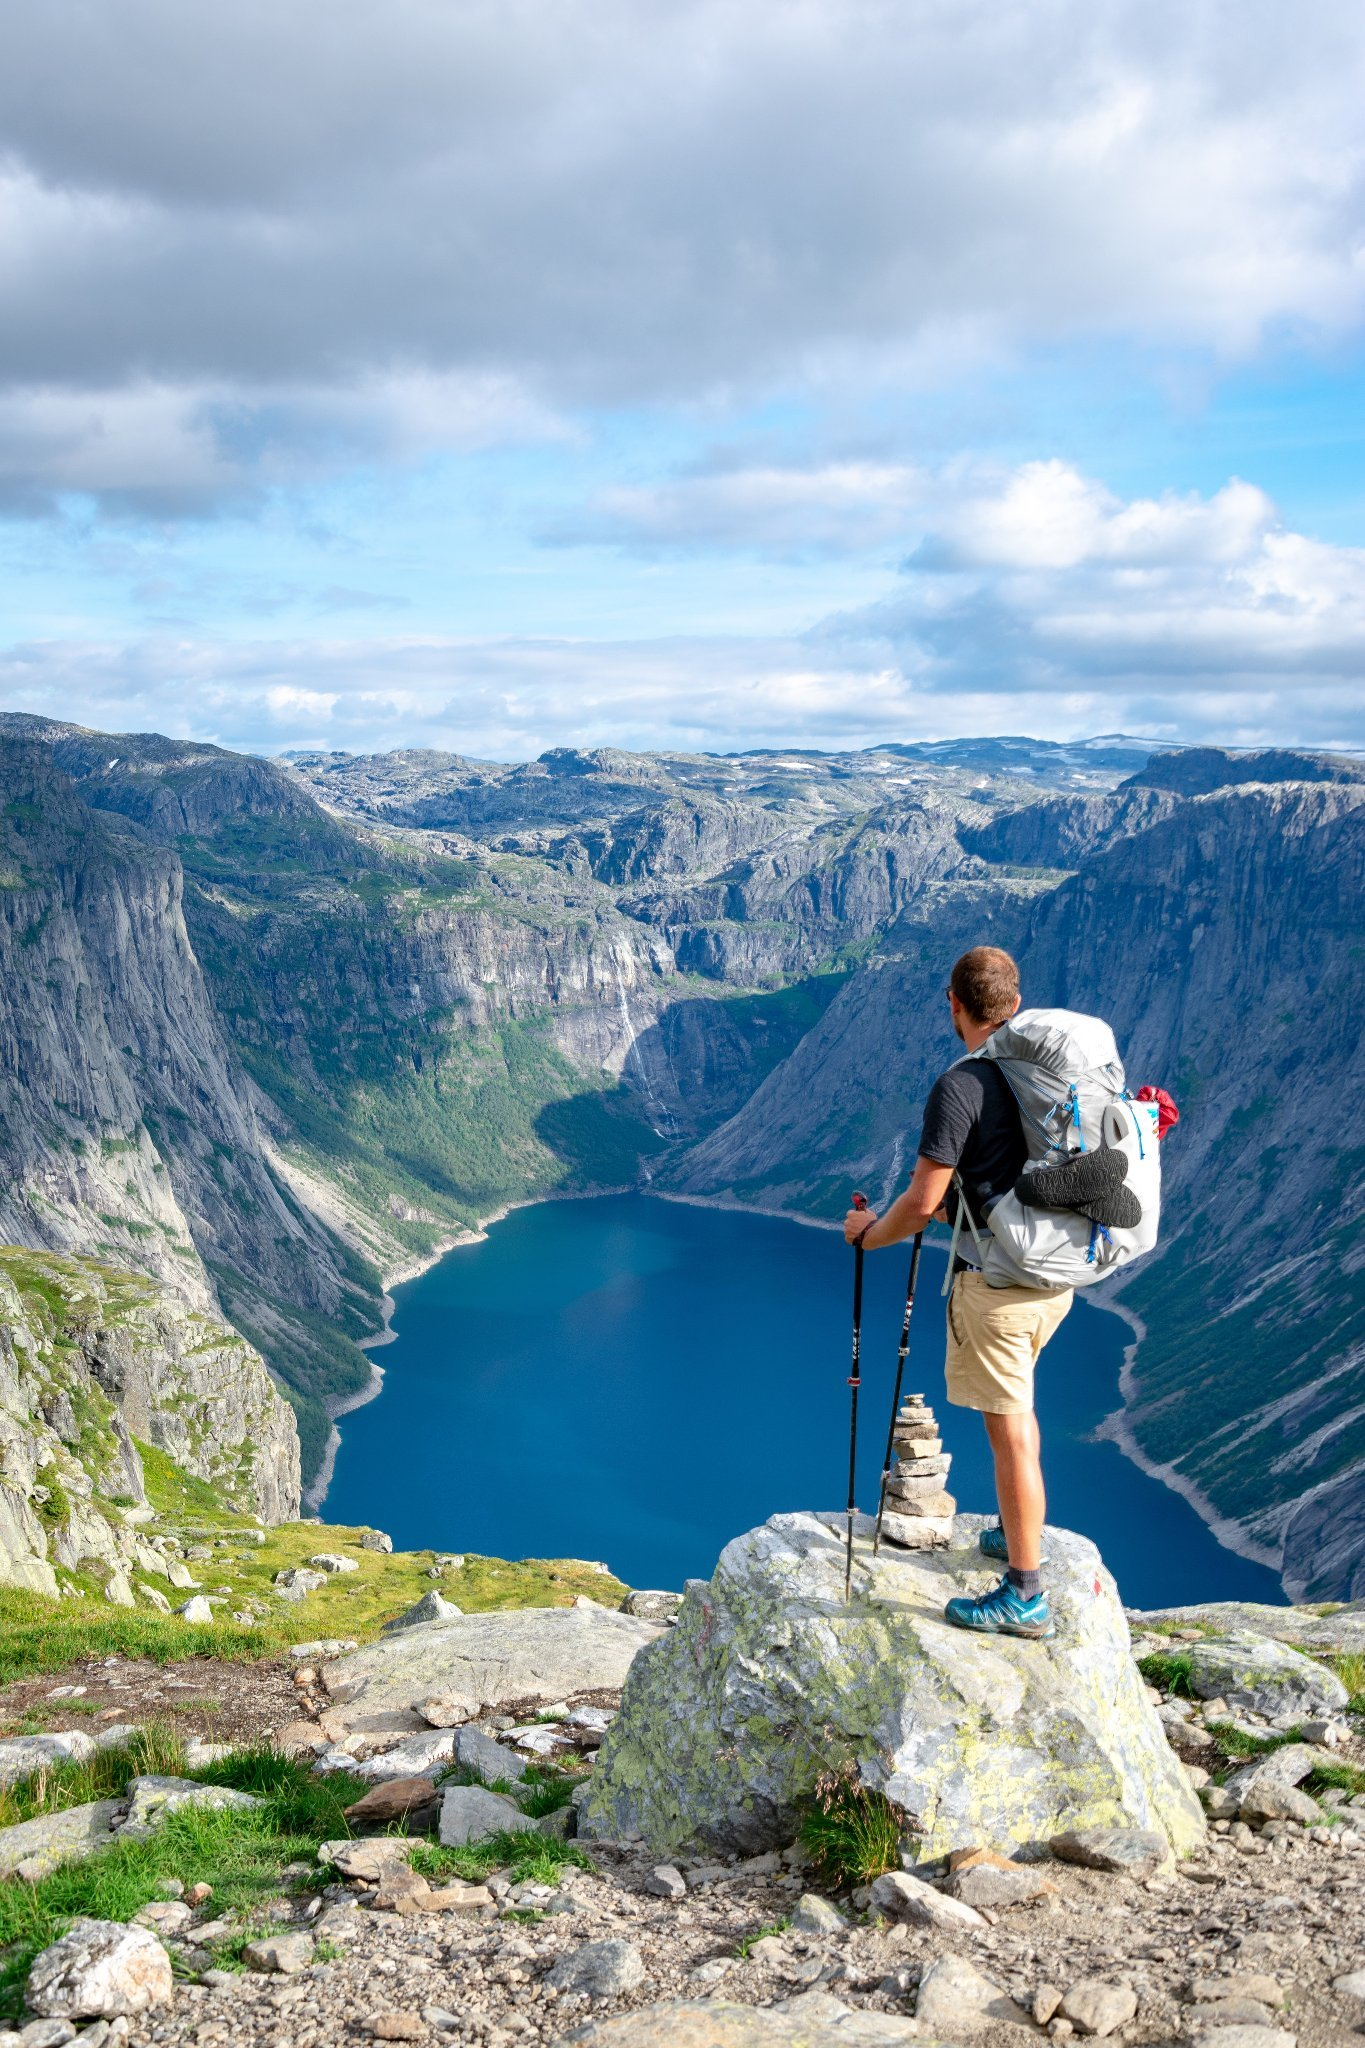 Hiking, Exploring, Camping and more